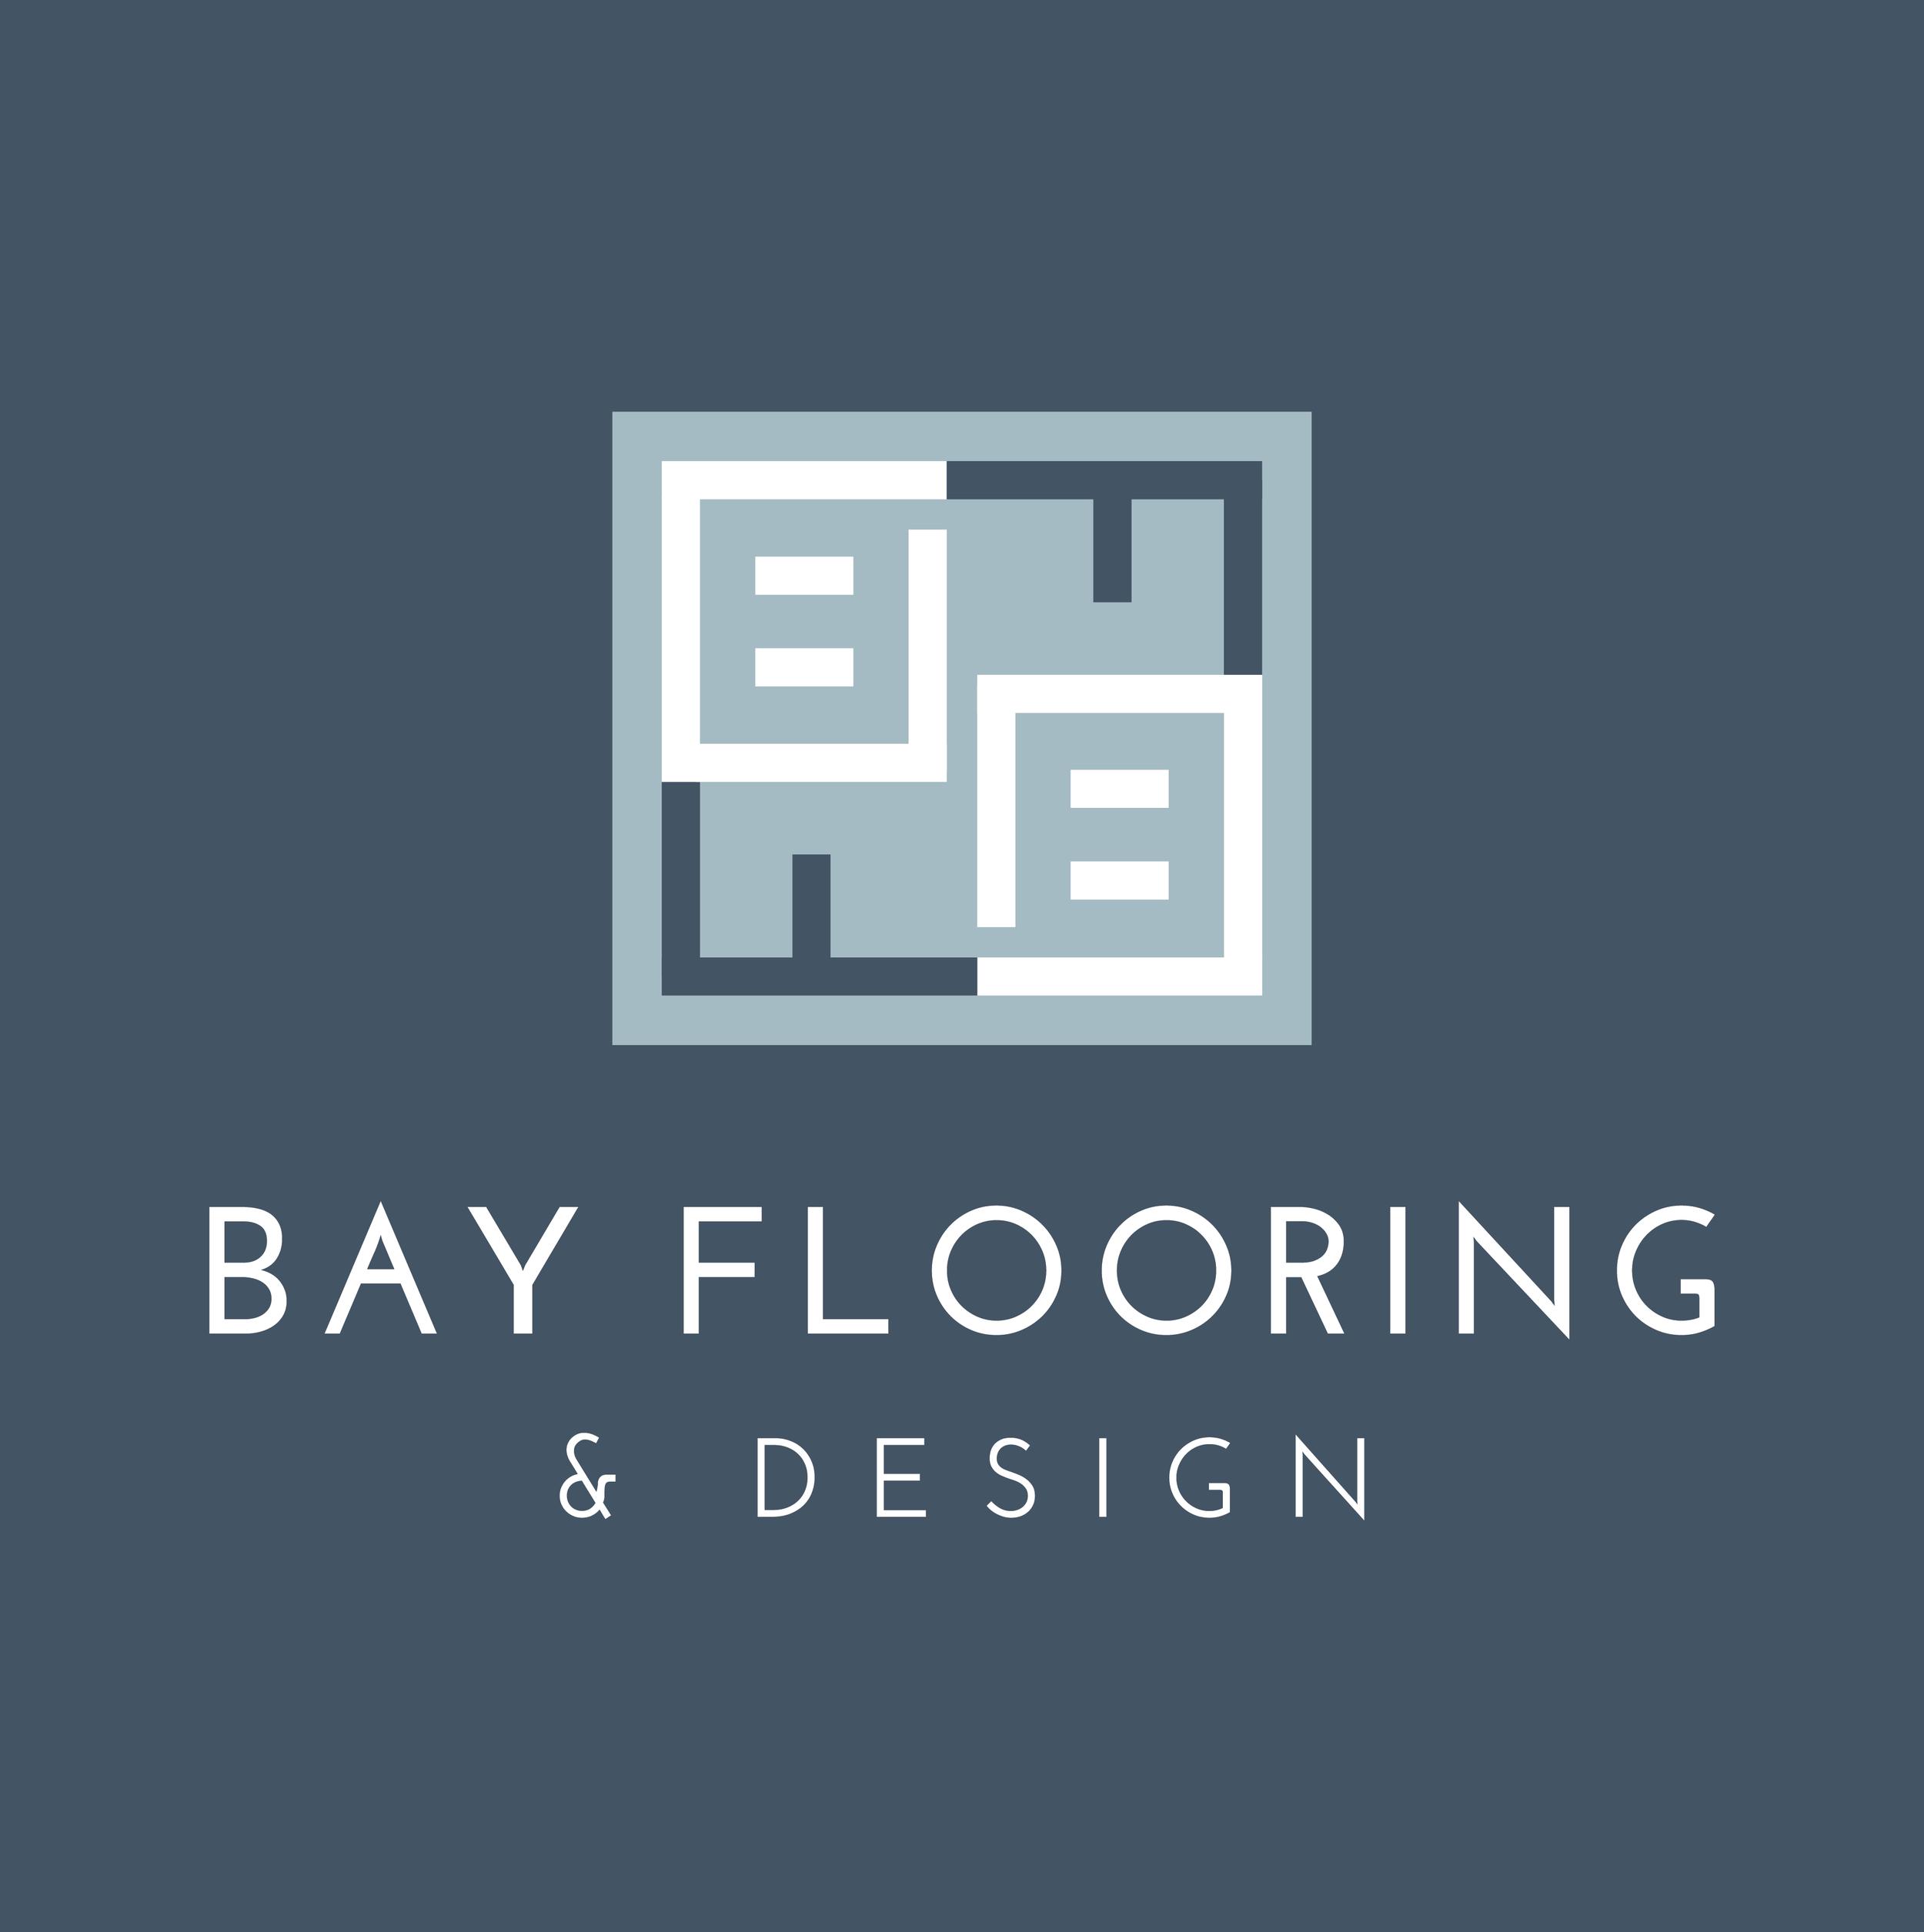 Bay Flooring & Design    brand // s  ignage